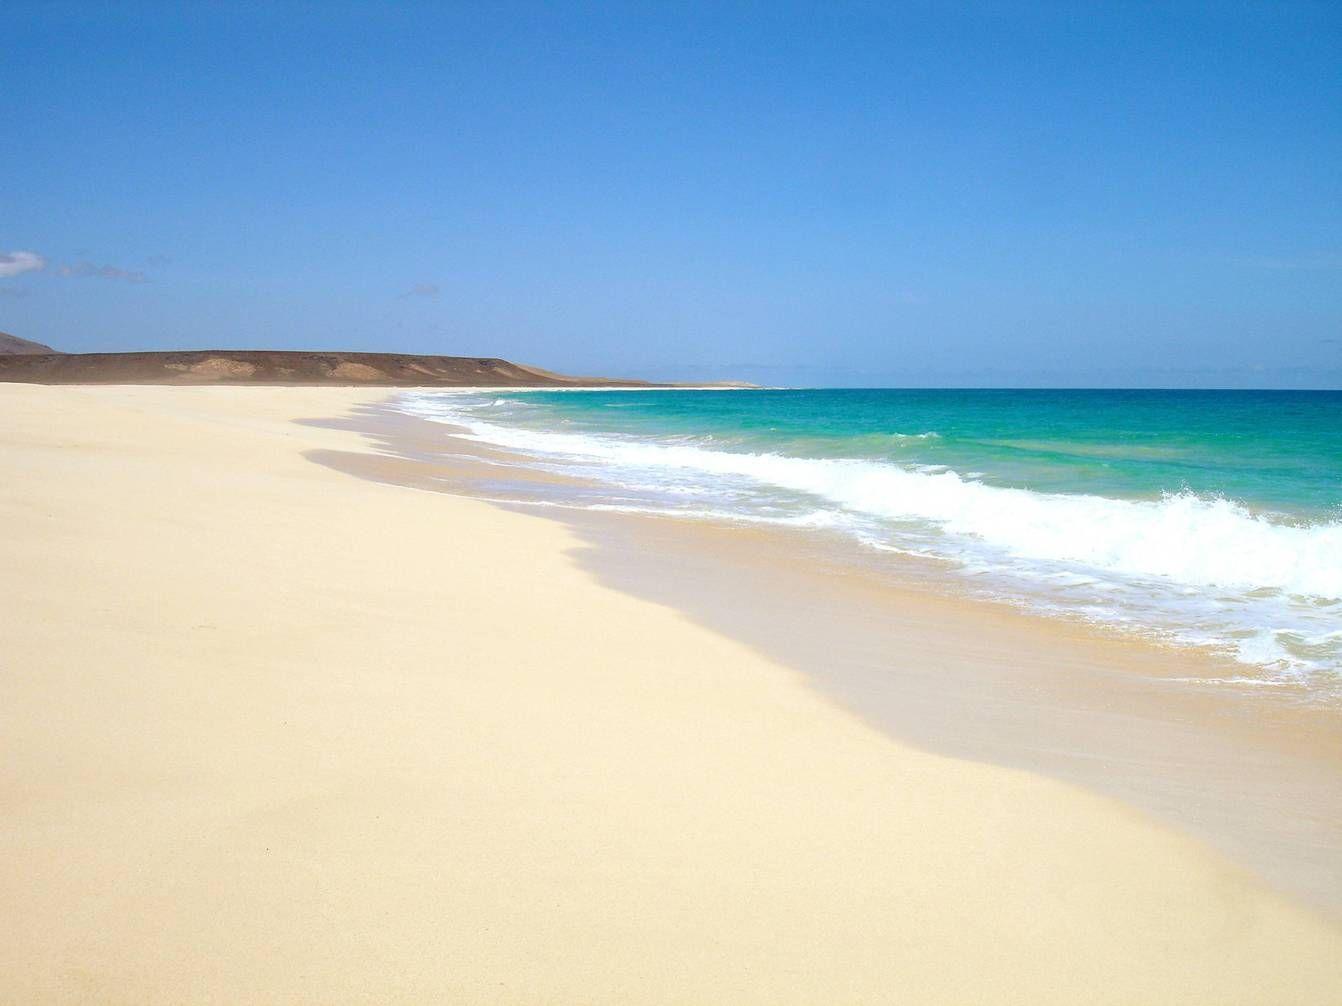 spiaggia-corralejo-fuerteventura.jpg